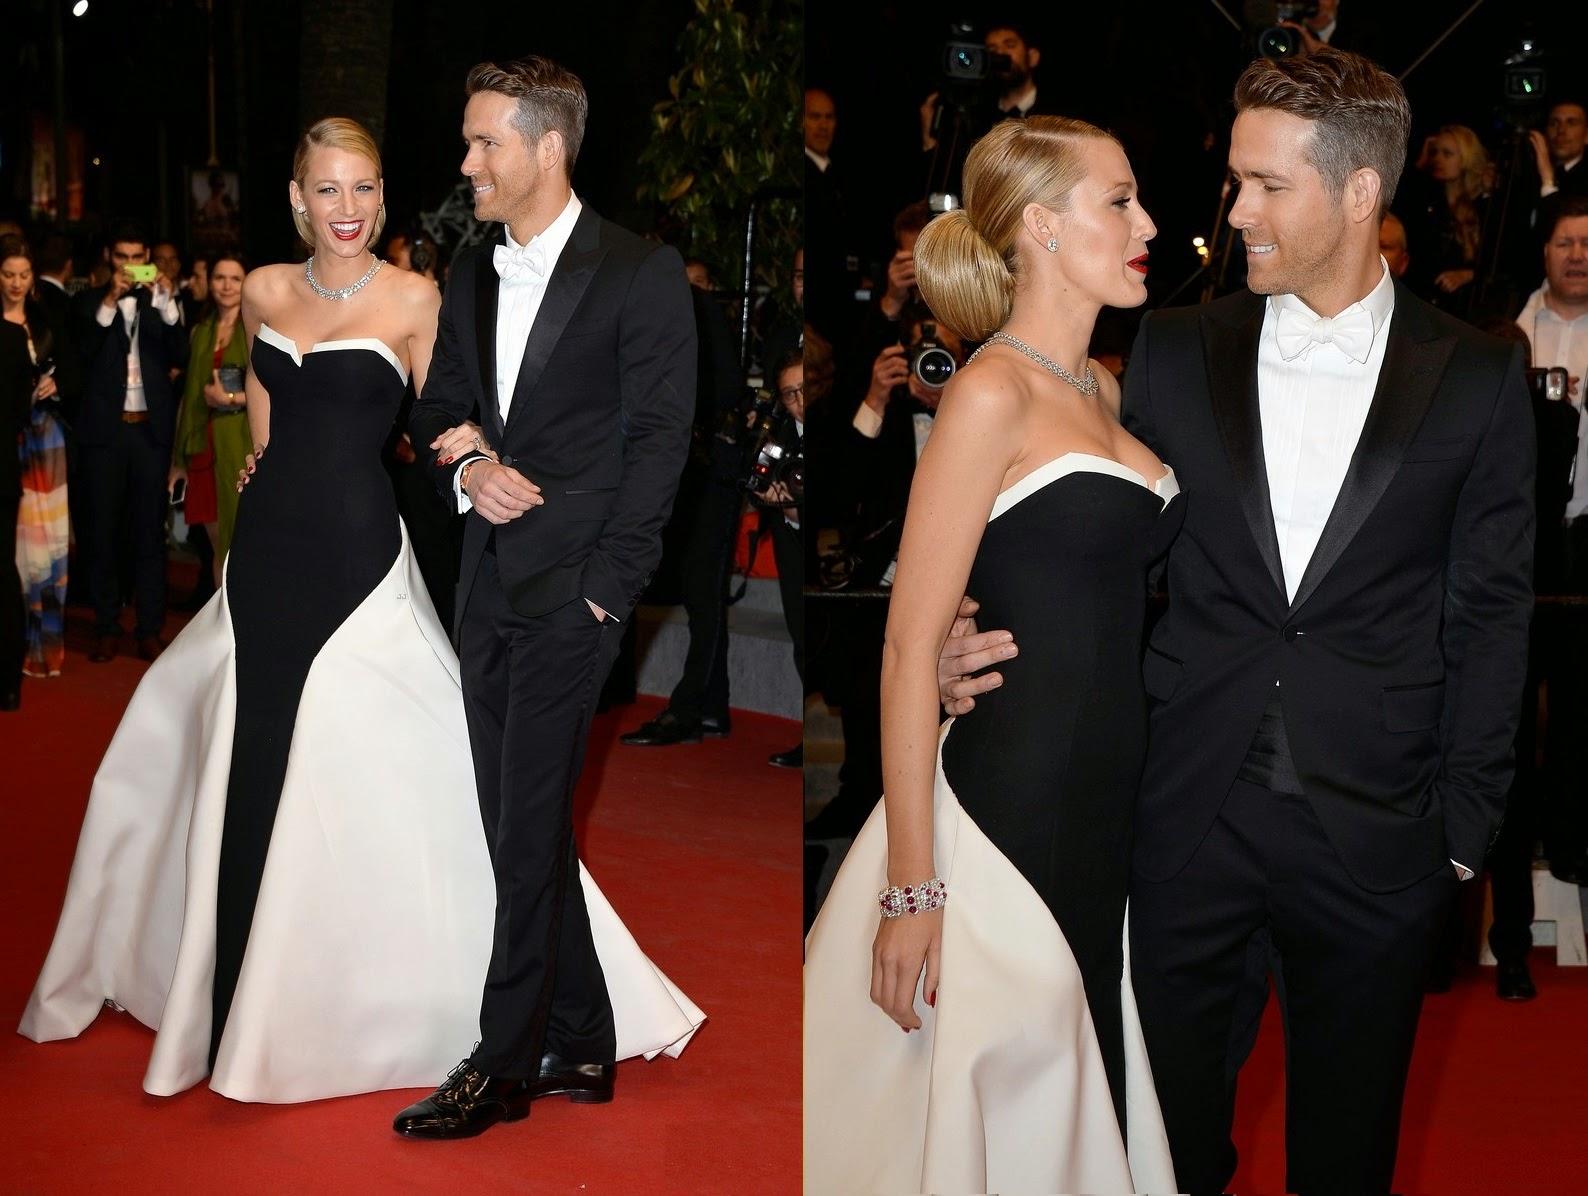 Ryan Reynolds Tuxedo Cannes 2014